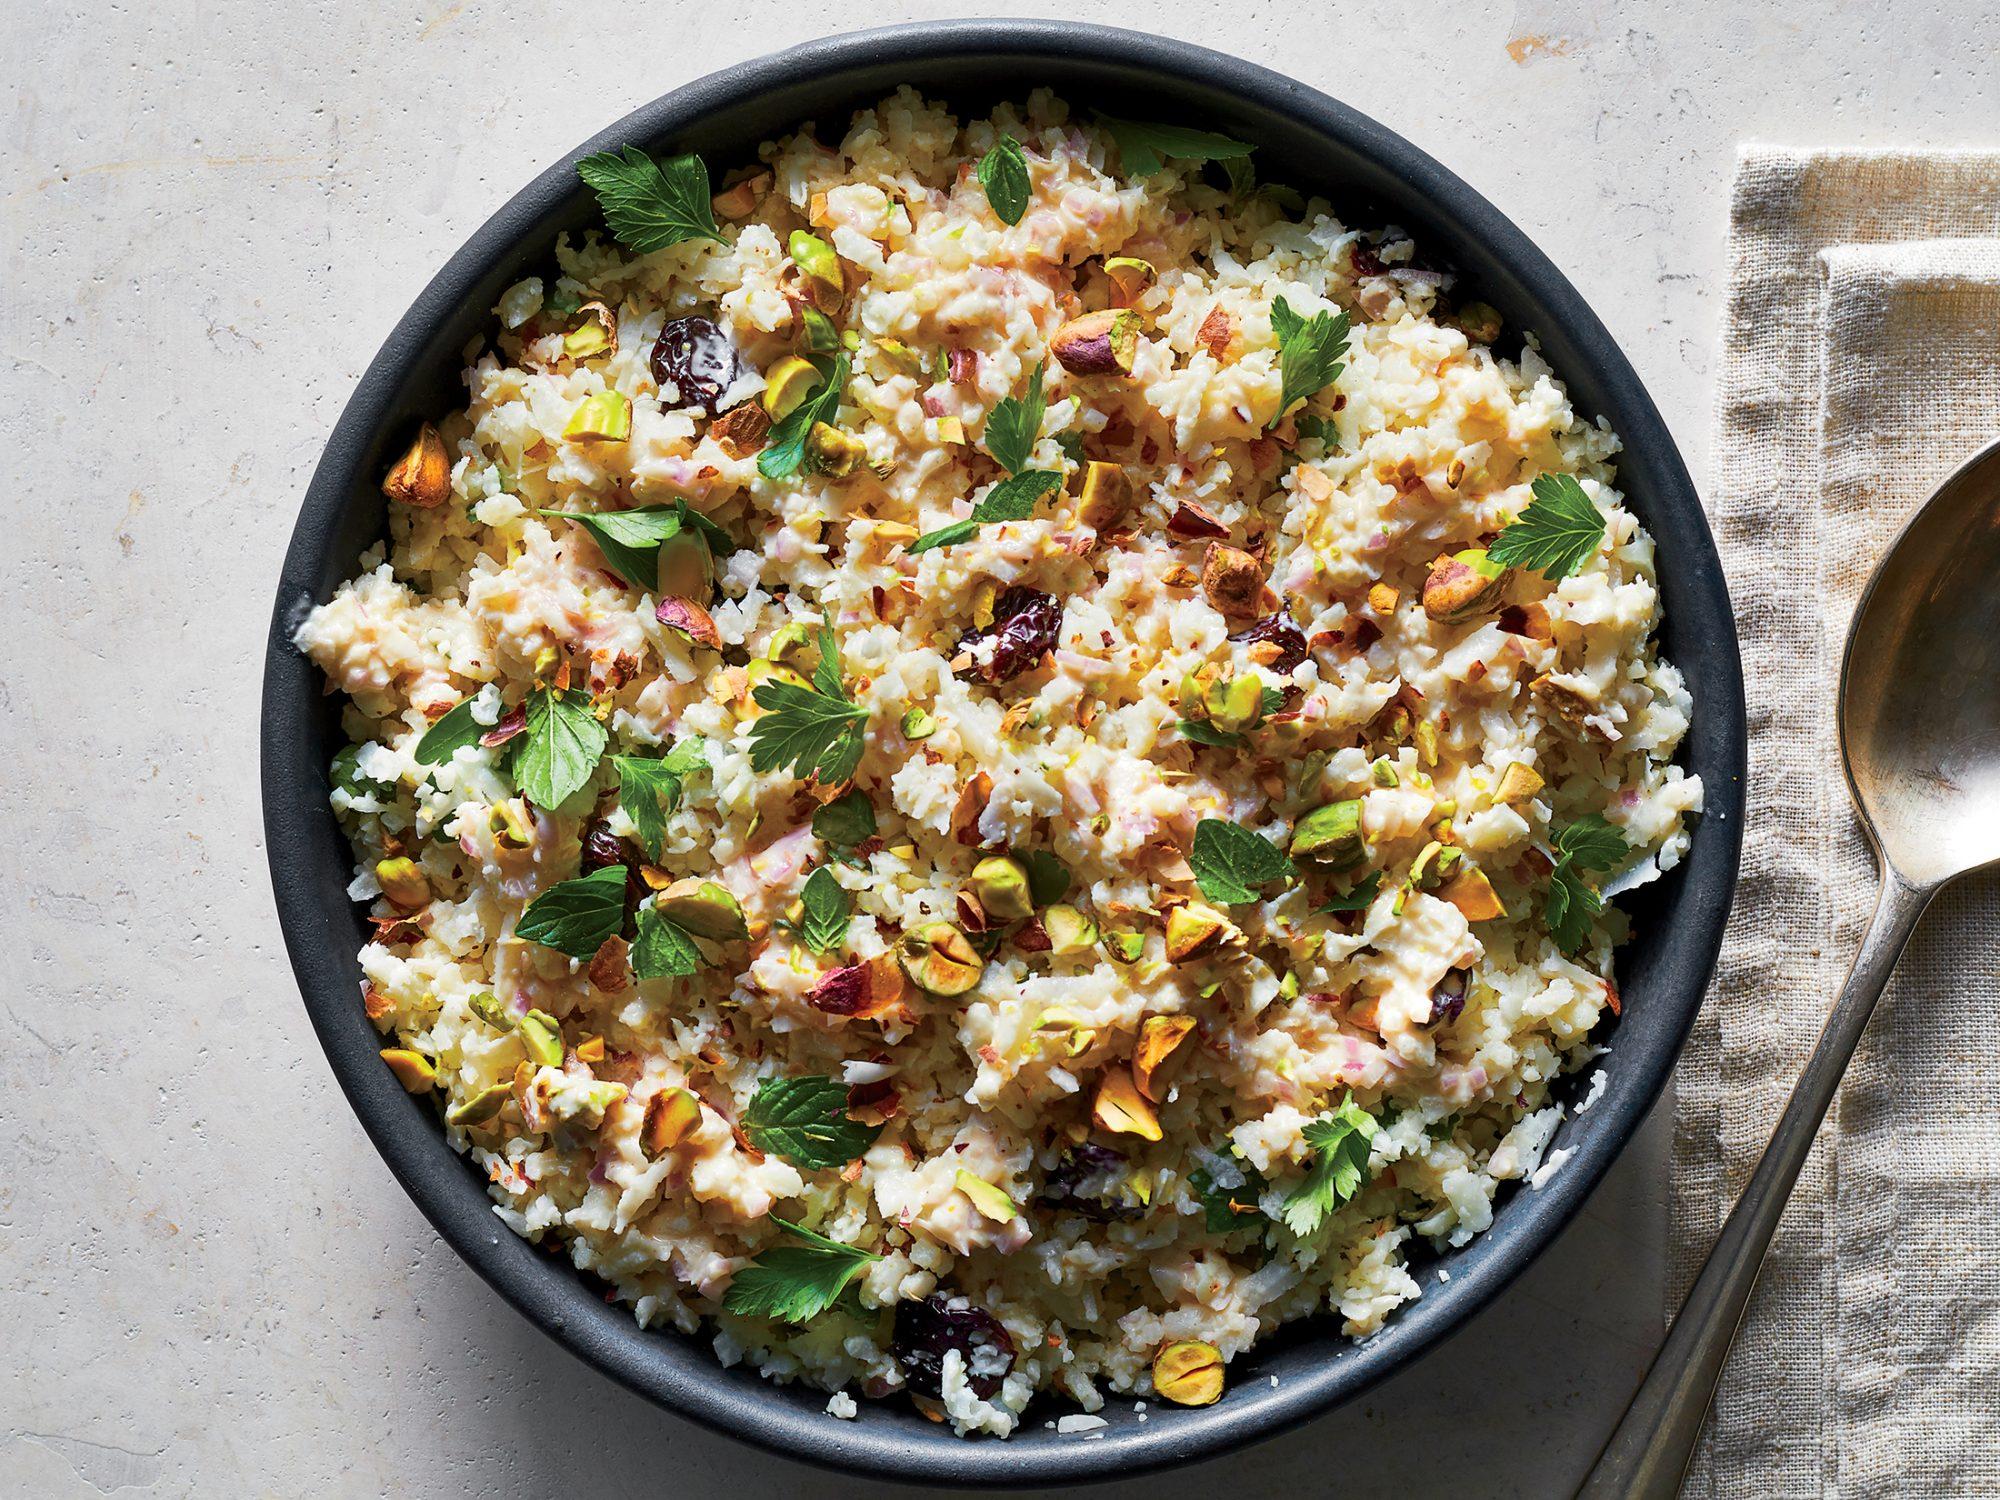 Cauliflower Salad with Tahini Dressing